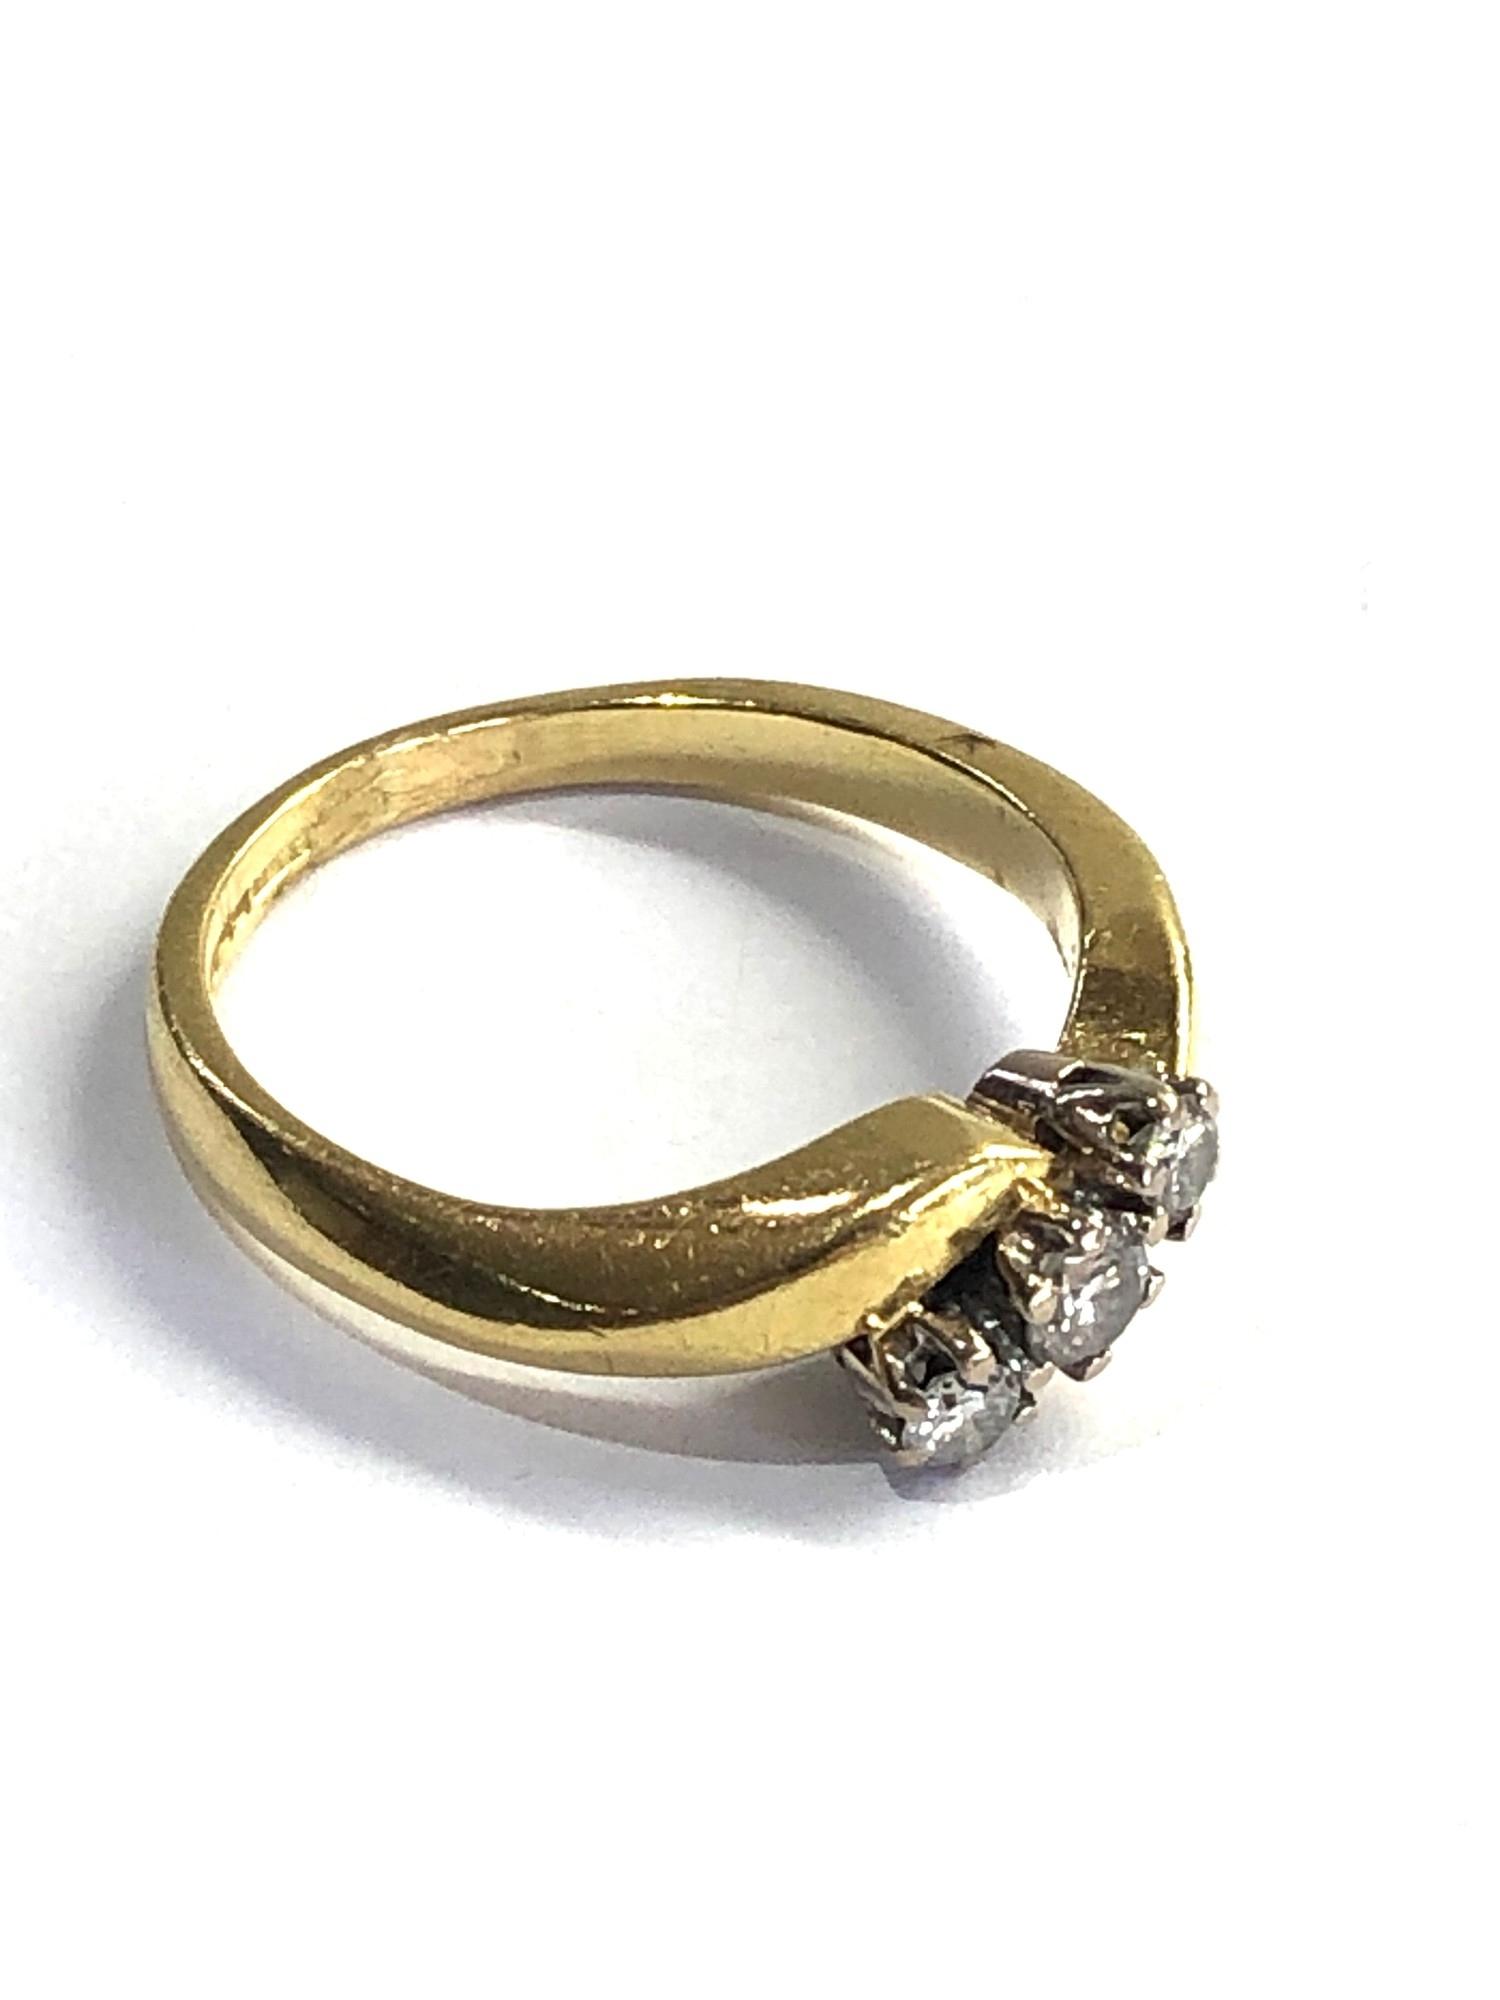 18ct gold diamond ring 0.25ct diamonds weight 4.3g - Image 3 of 4